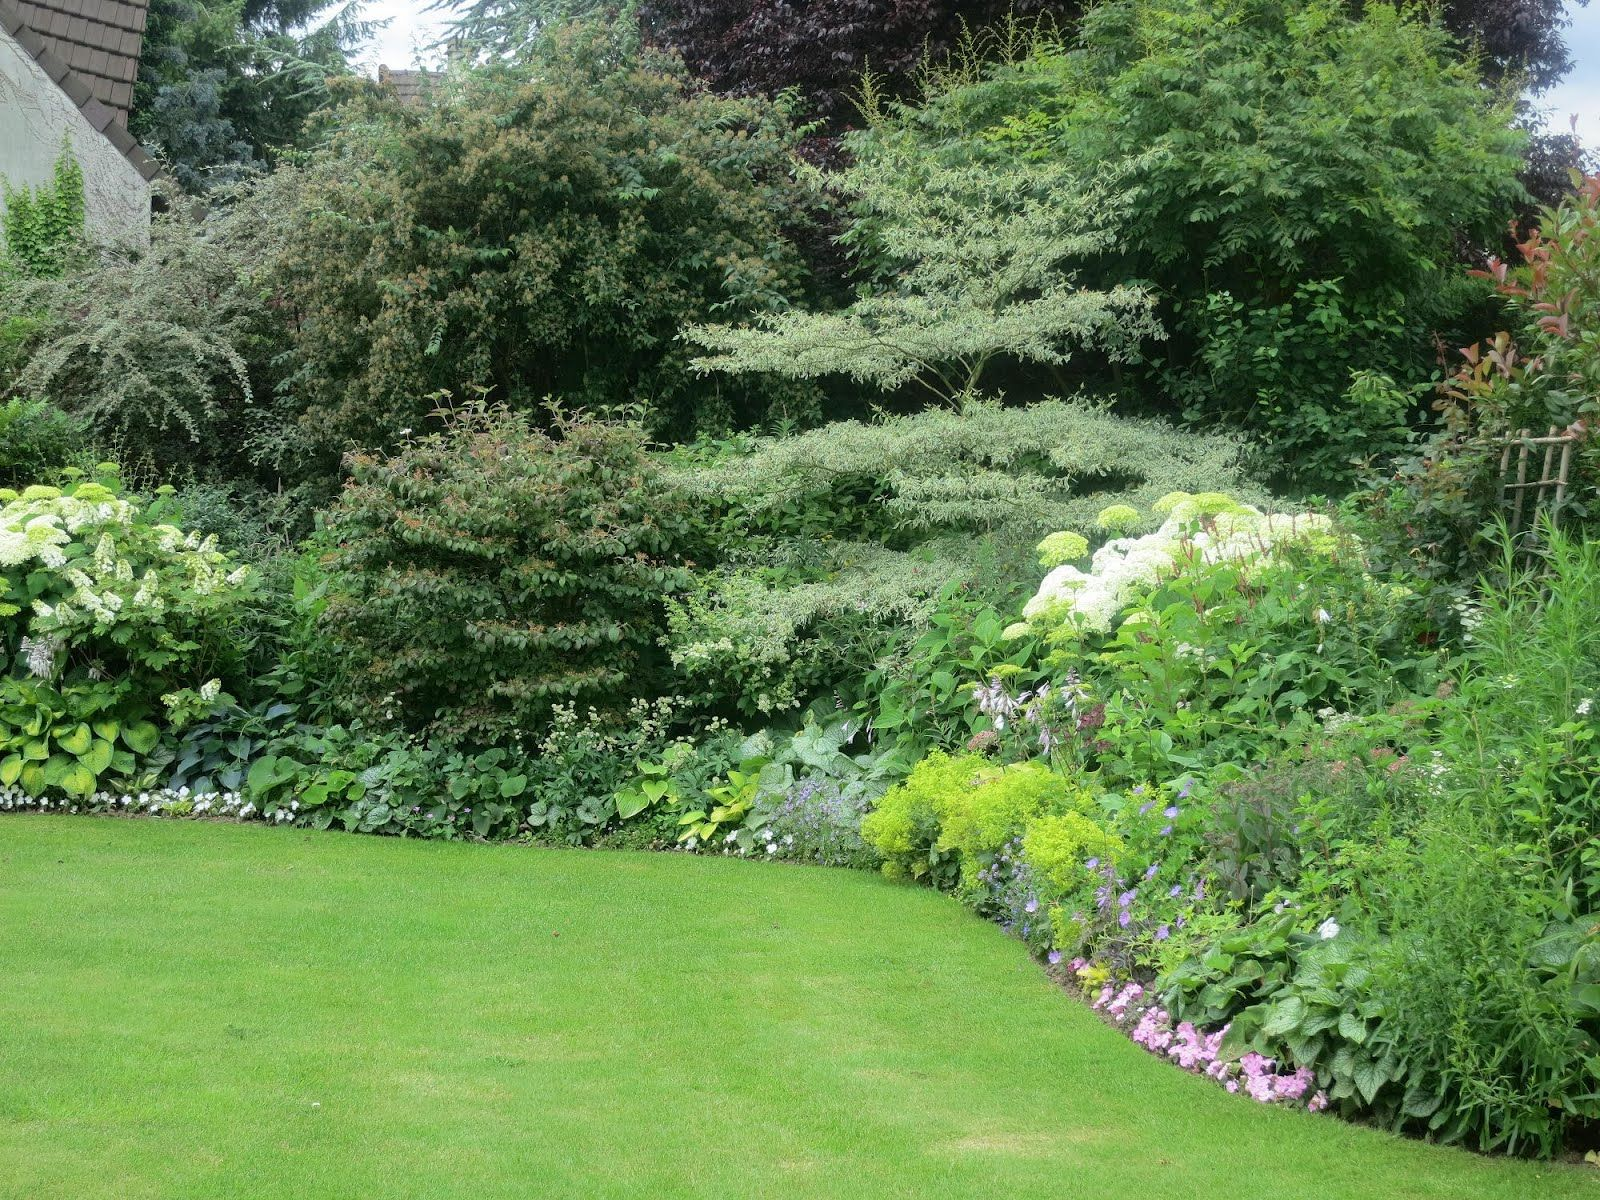 Jardin ombre mixed border garden inspiration for Les plus beaux jardins anglais